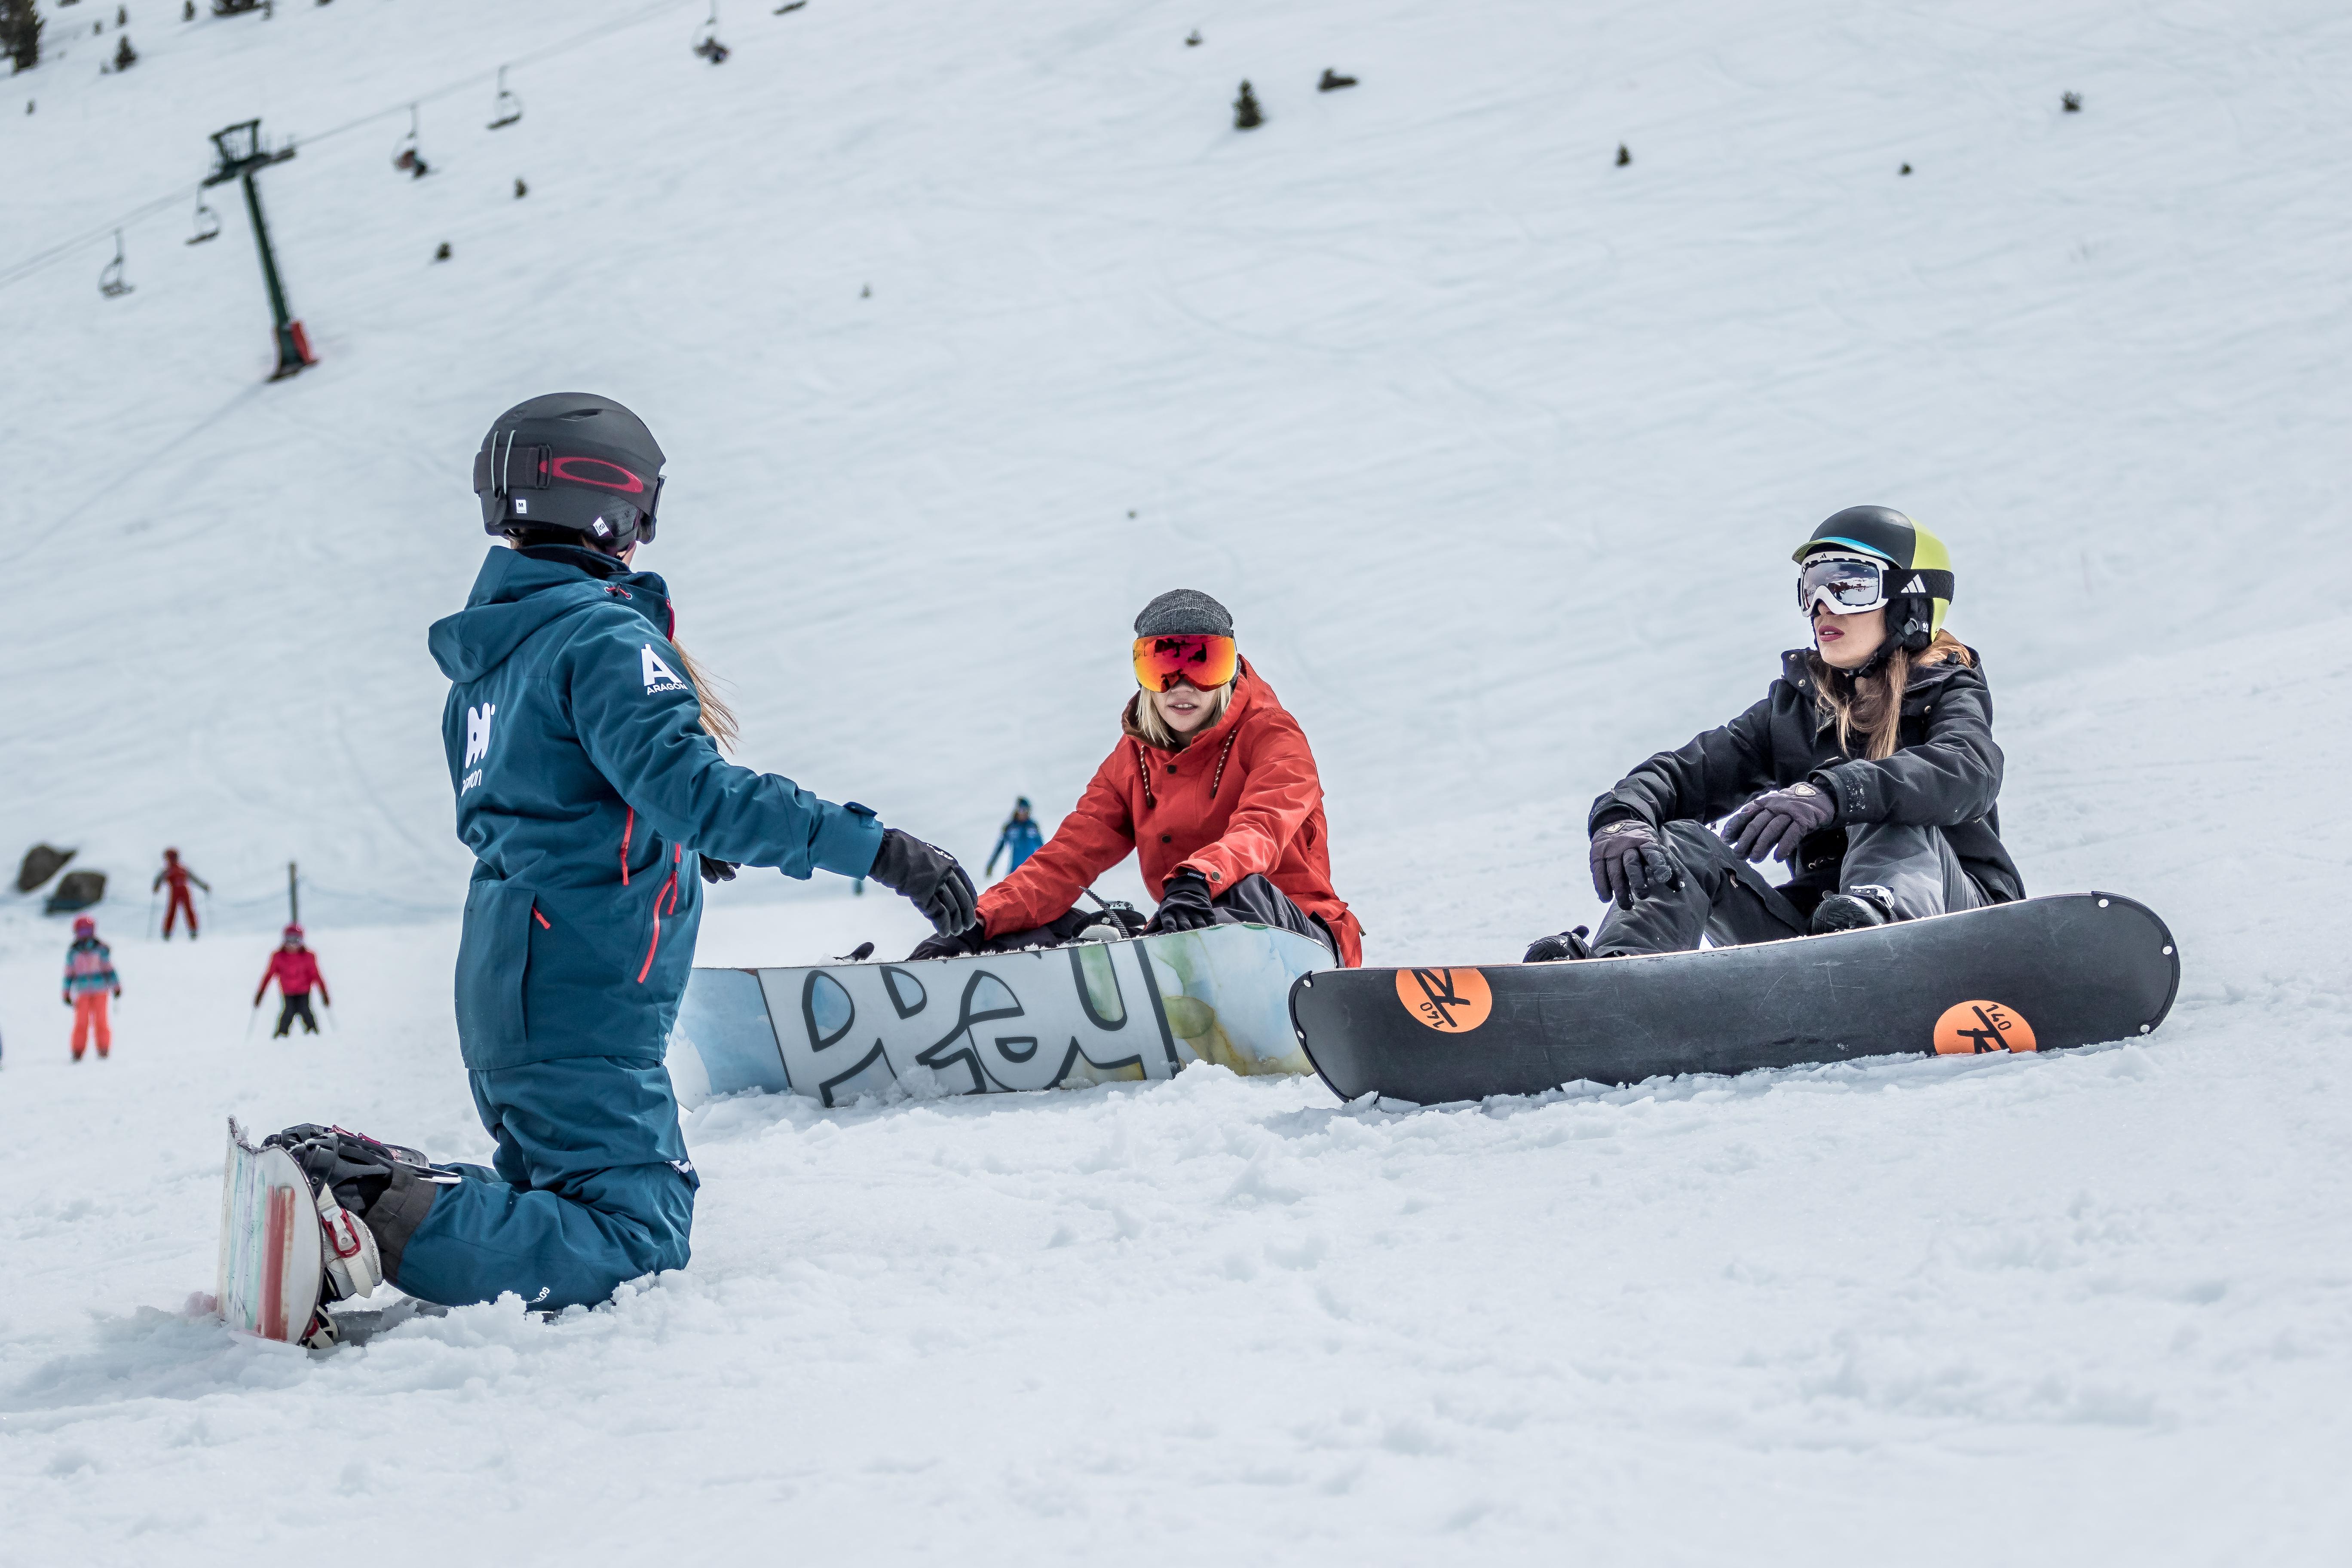 ¿Es difícil aprender a hacer Snowboard?